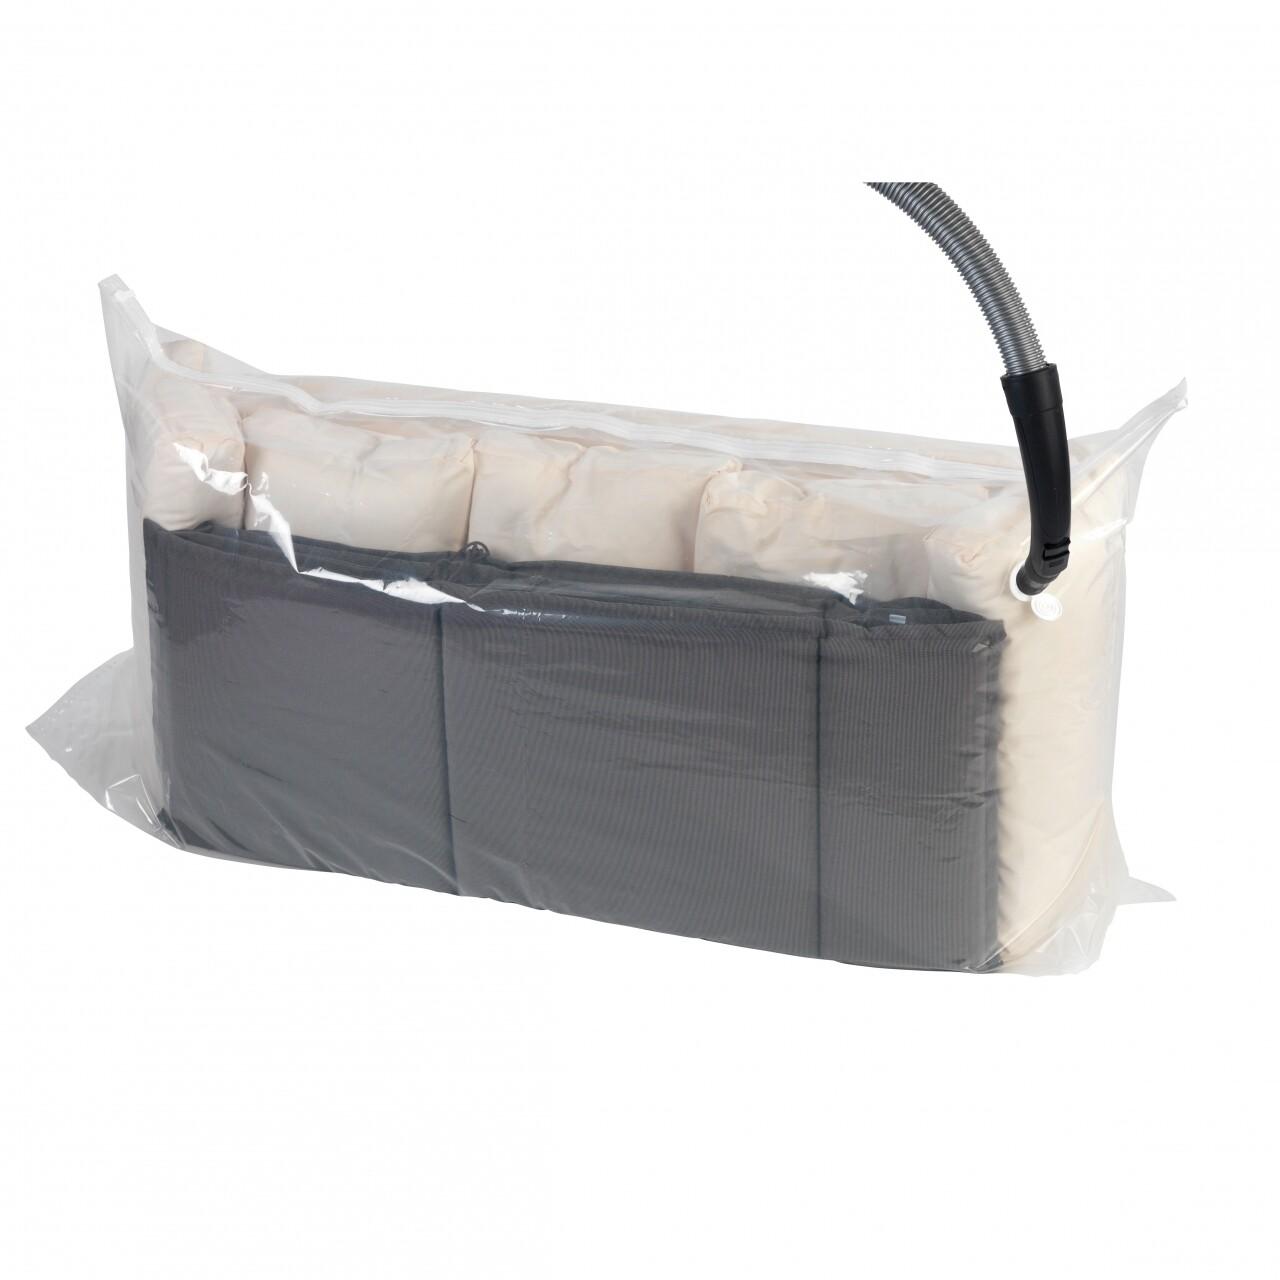 Punga de vidat, WENKO XXL, 50x180x90 cm, plastic, transparent